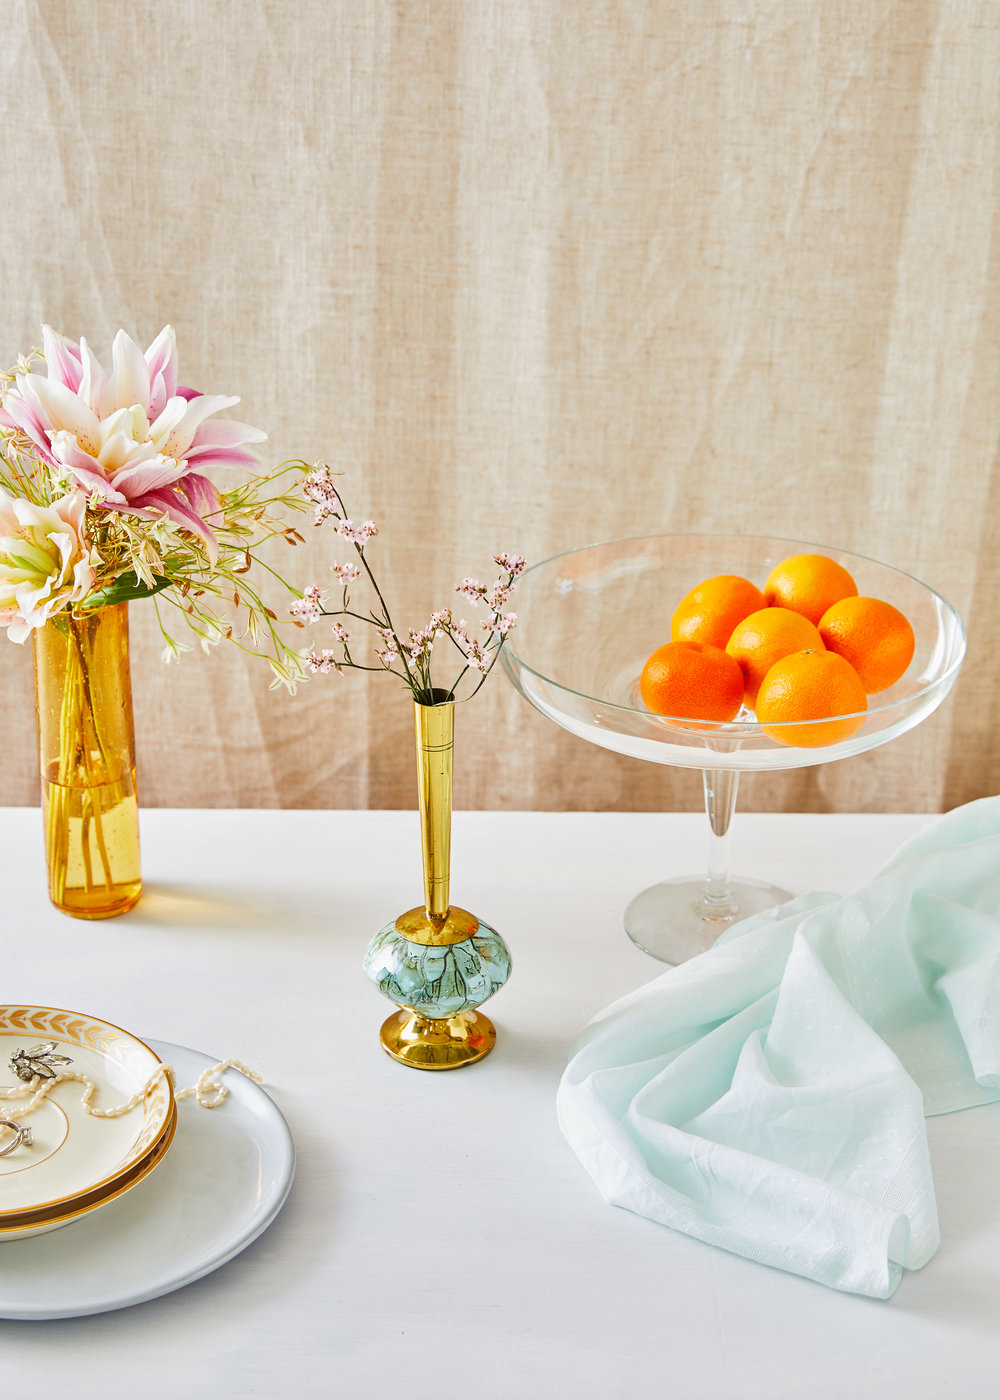 Tangerine   Photo by Joe St. PIerre, Styled by Kaylei McGaw